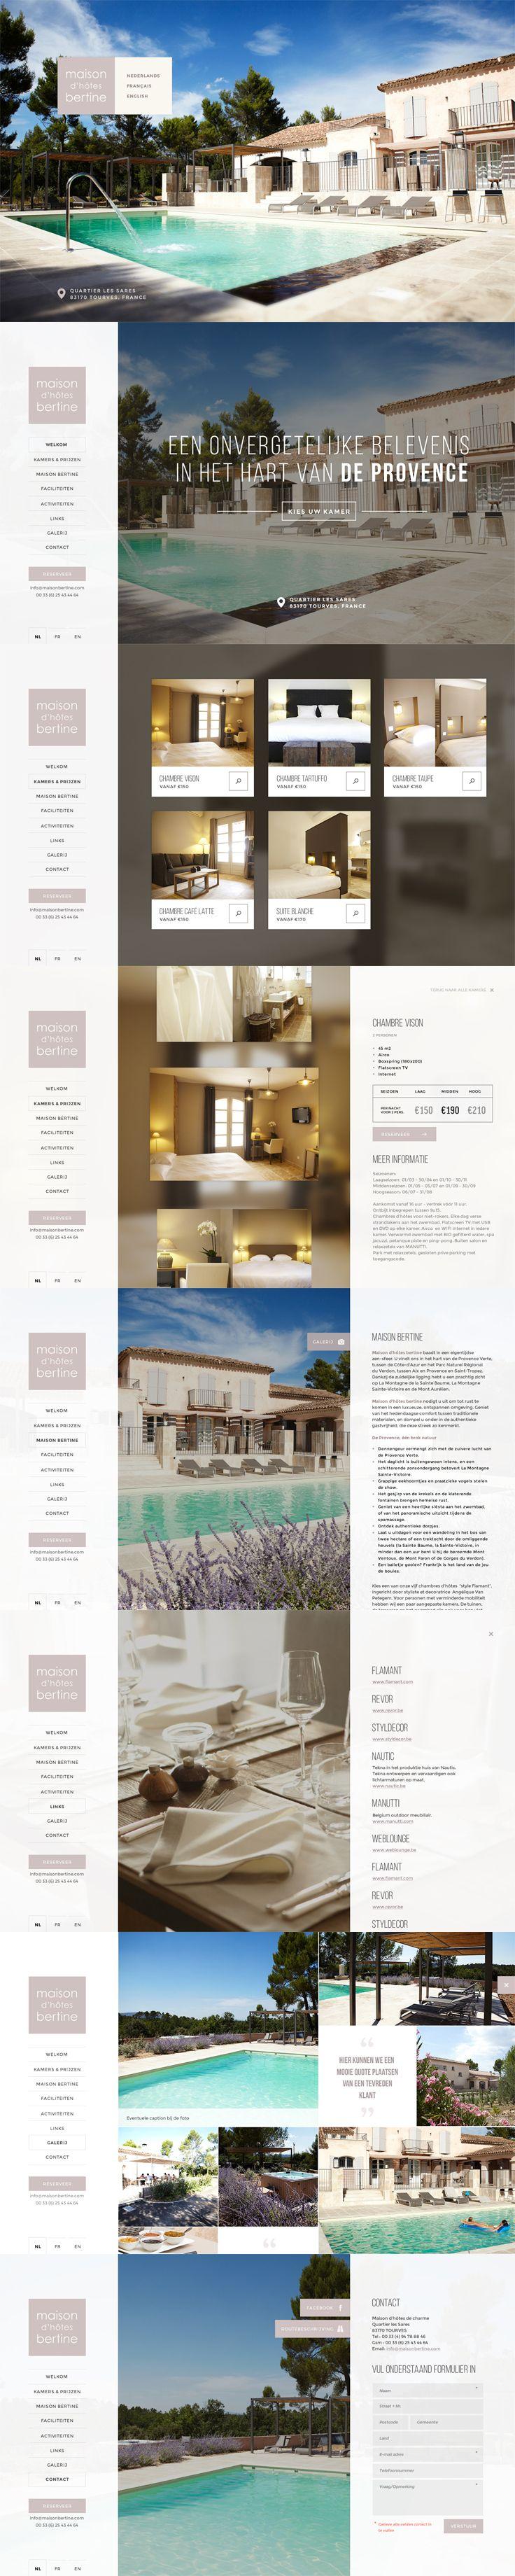 Website for Maison Bertine - Bed&Breakfast in the Provence - Designed by Weblounge - www.weblounge.be #layout #webdesign #website #bed&breakfast #provence #france